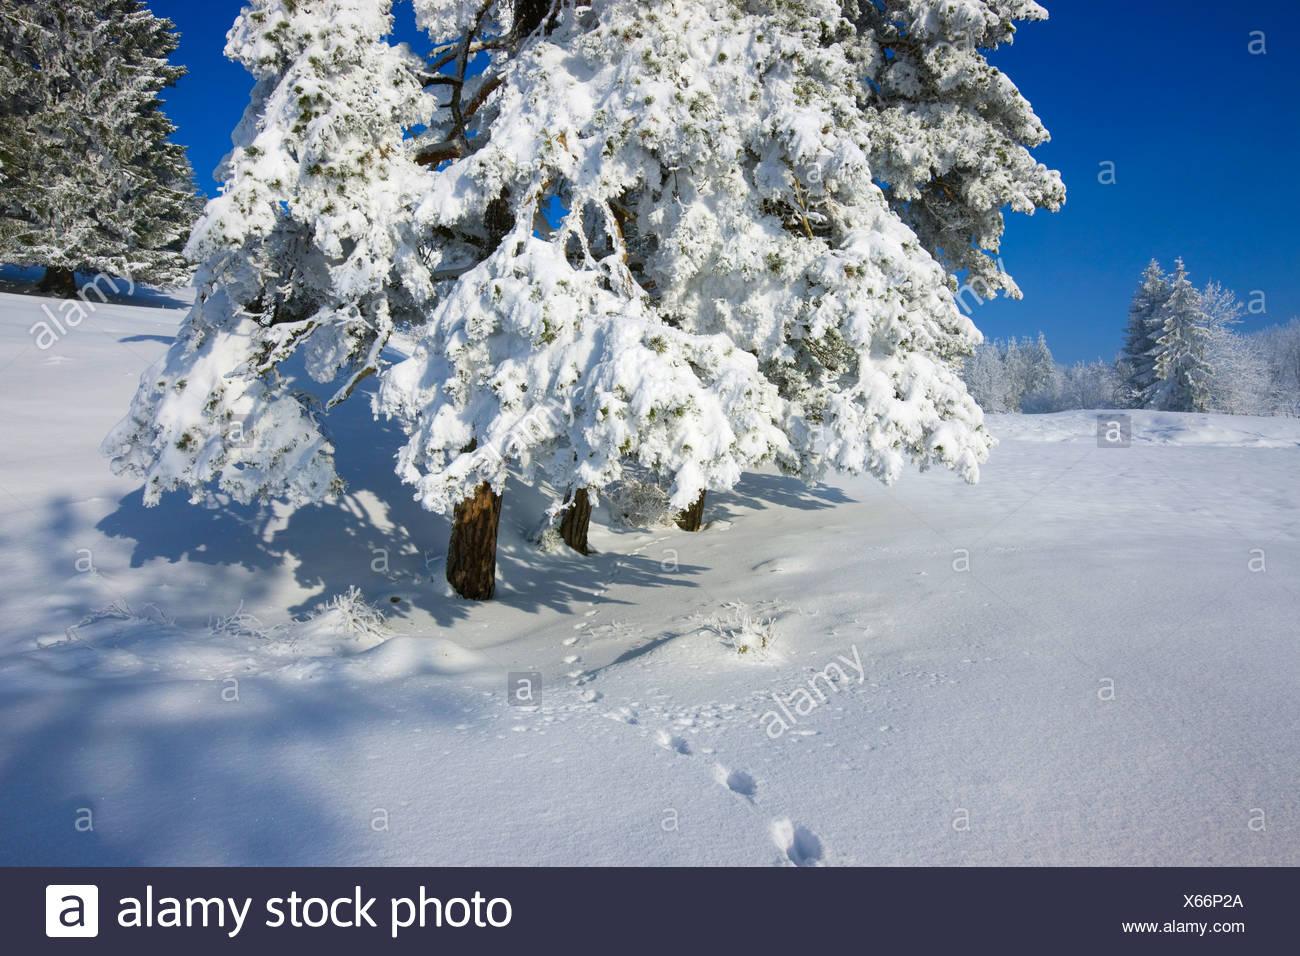 Saint Brais, Switzerland, Europe, canton Jura, trees, snow, hoarfrost, cold, winter, tracks, traces, animal tracks - Stock Image